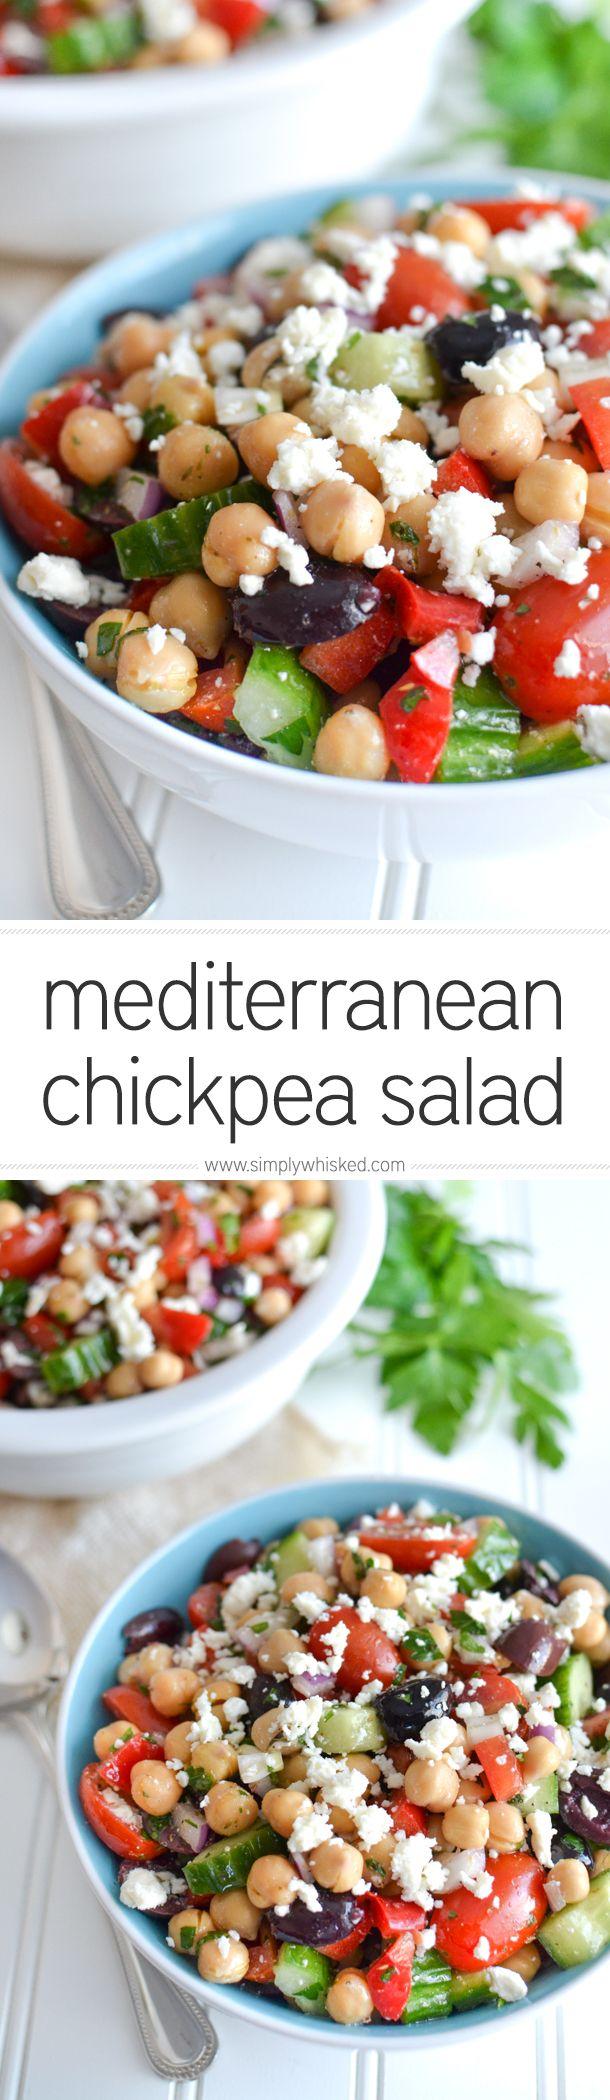 Mediterranean Chickpea Salad | simplywhisked.com